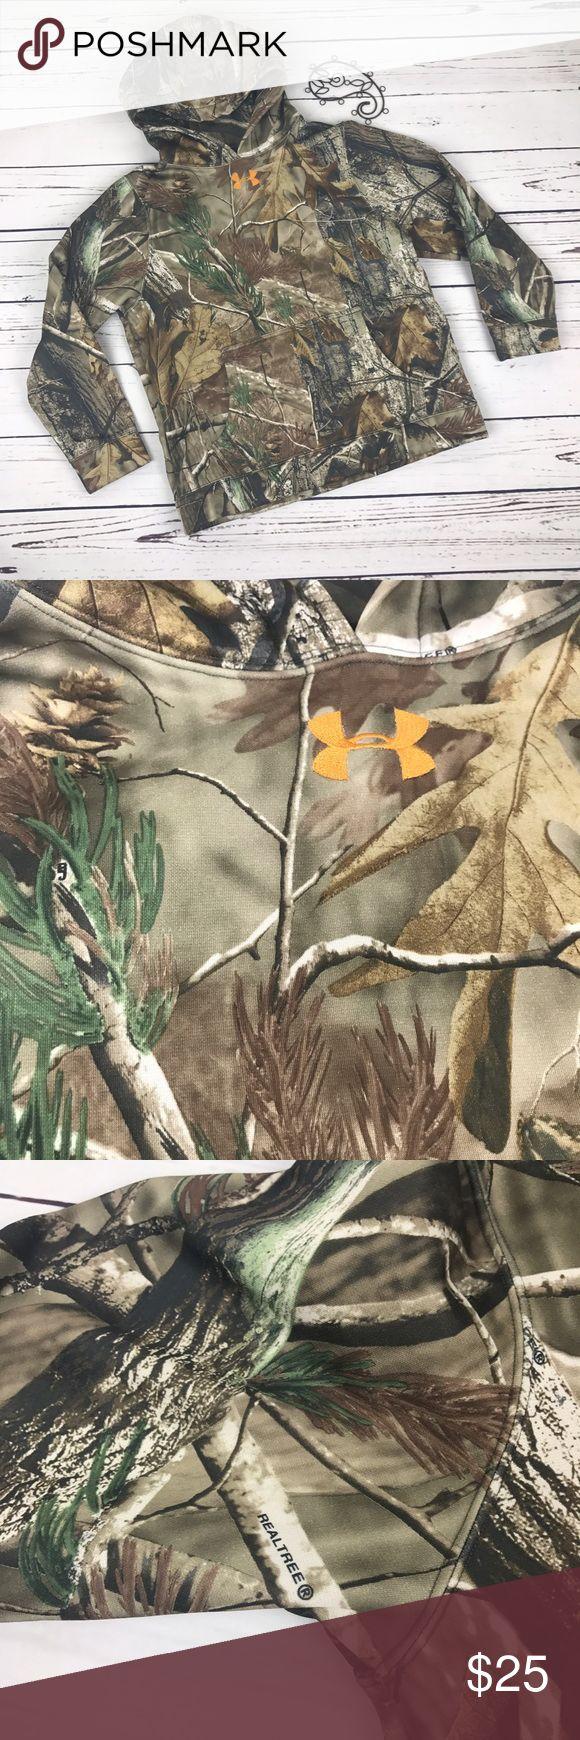 Under Armour Camouflage Real Tree Hoodie Under armpit youth medium camo real tree Hoodie! Under Armour Shirts & Tops Sweatshirts & Hoodies